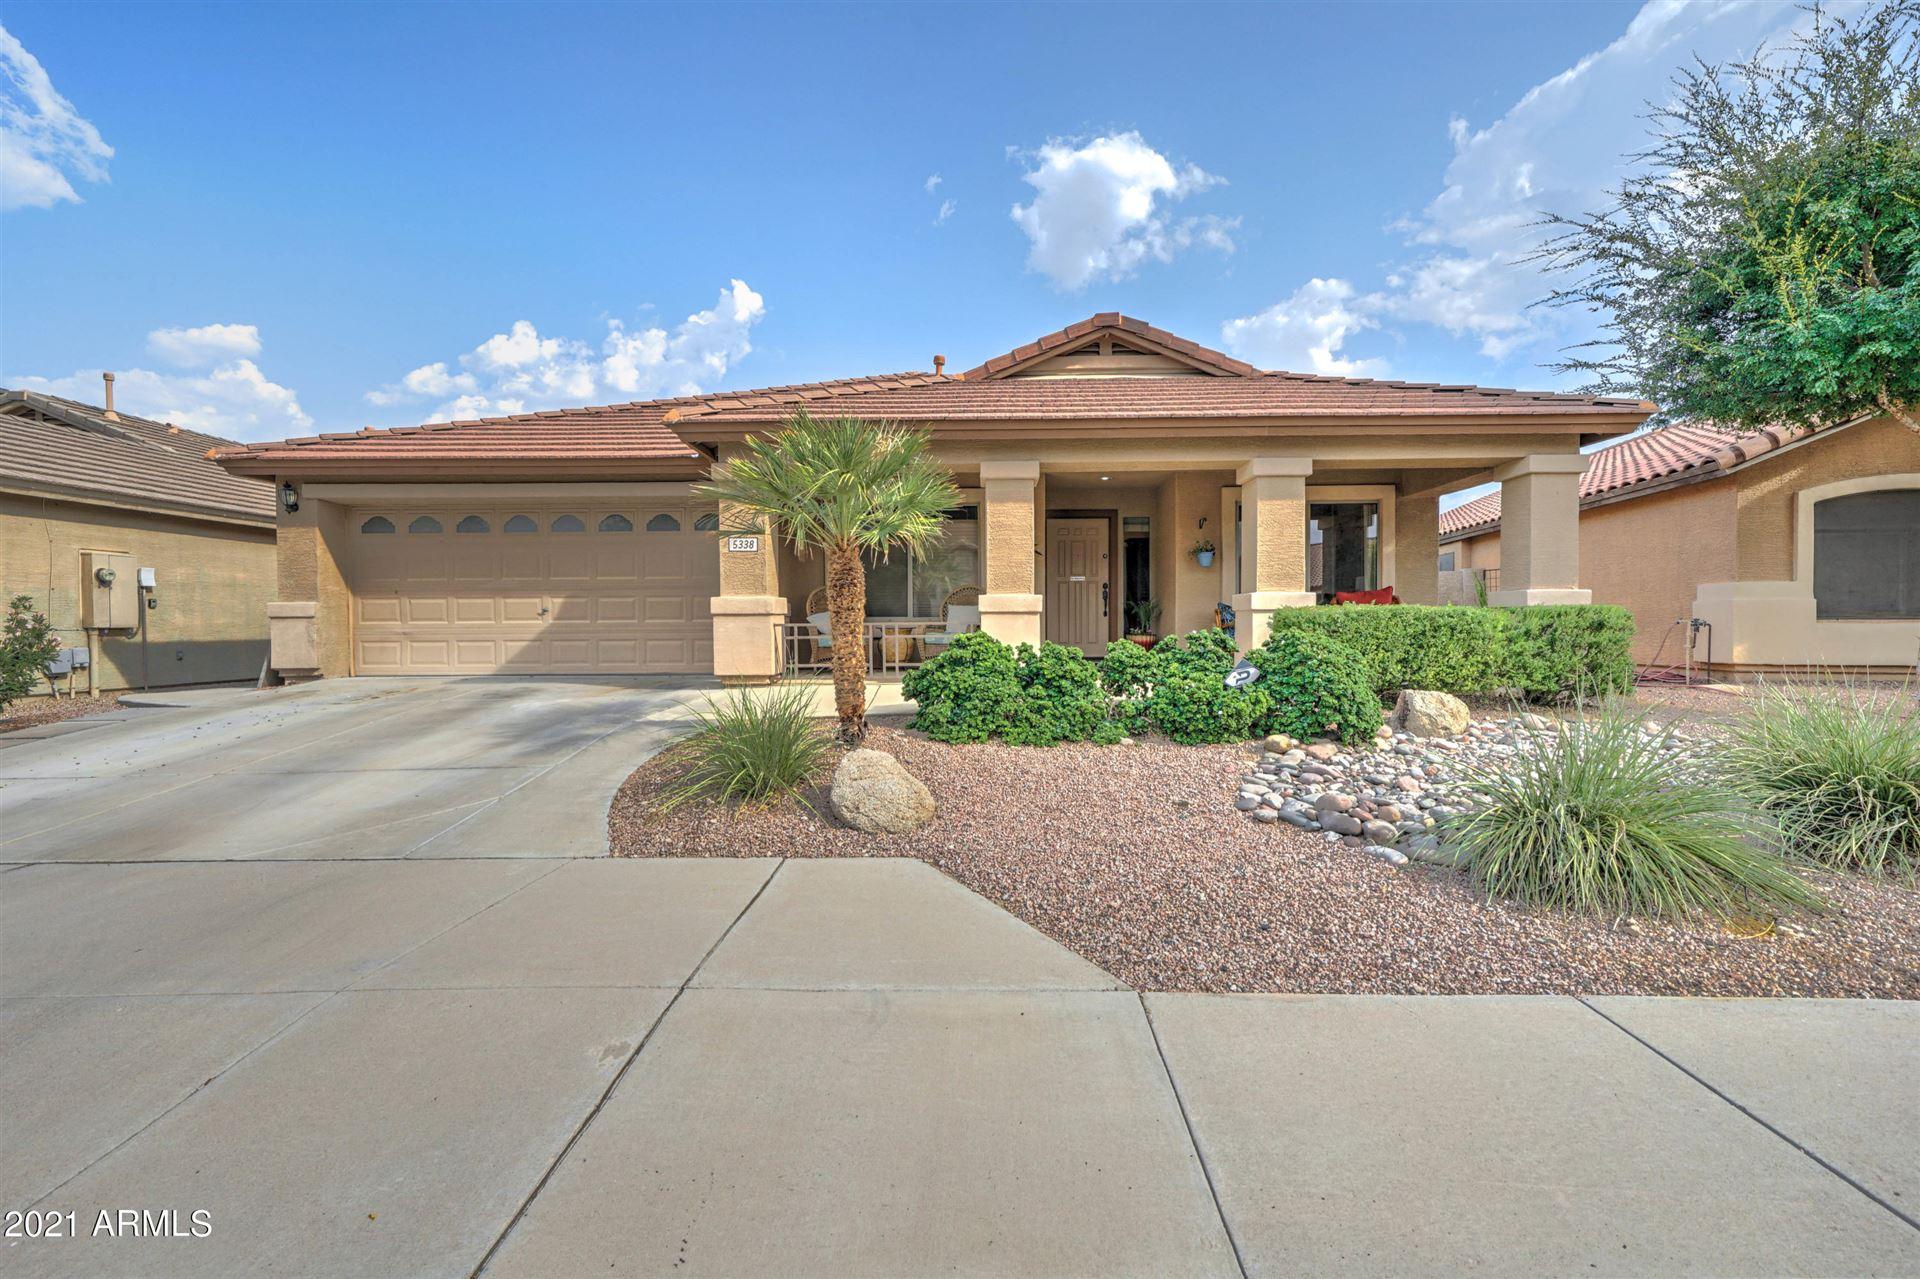 5338 N ORMONDO Way, Litchfield Park, AZ 85340 - MLS#: 6268797